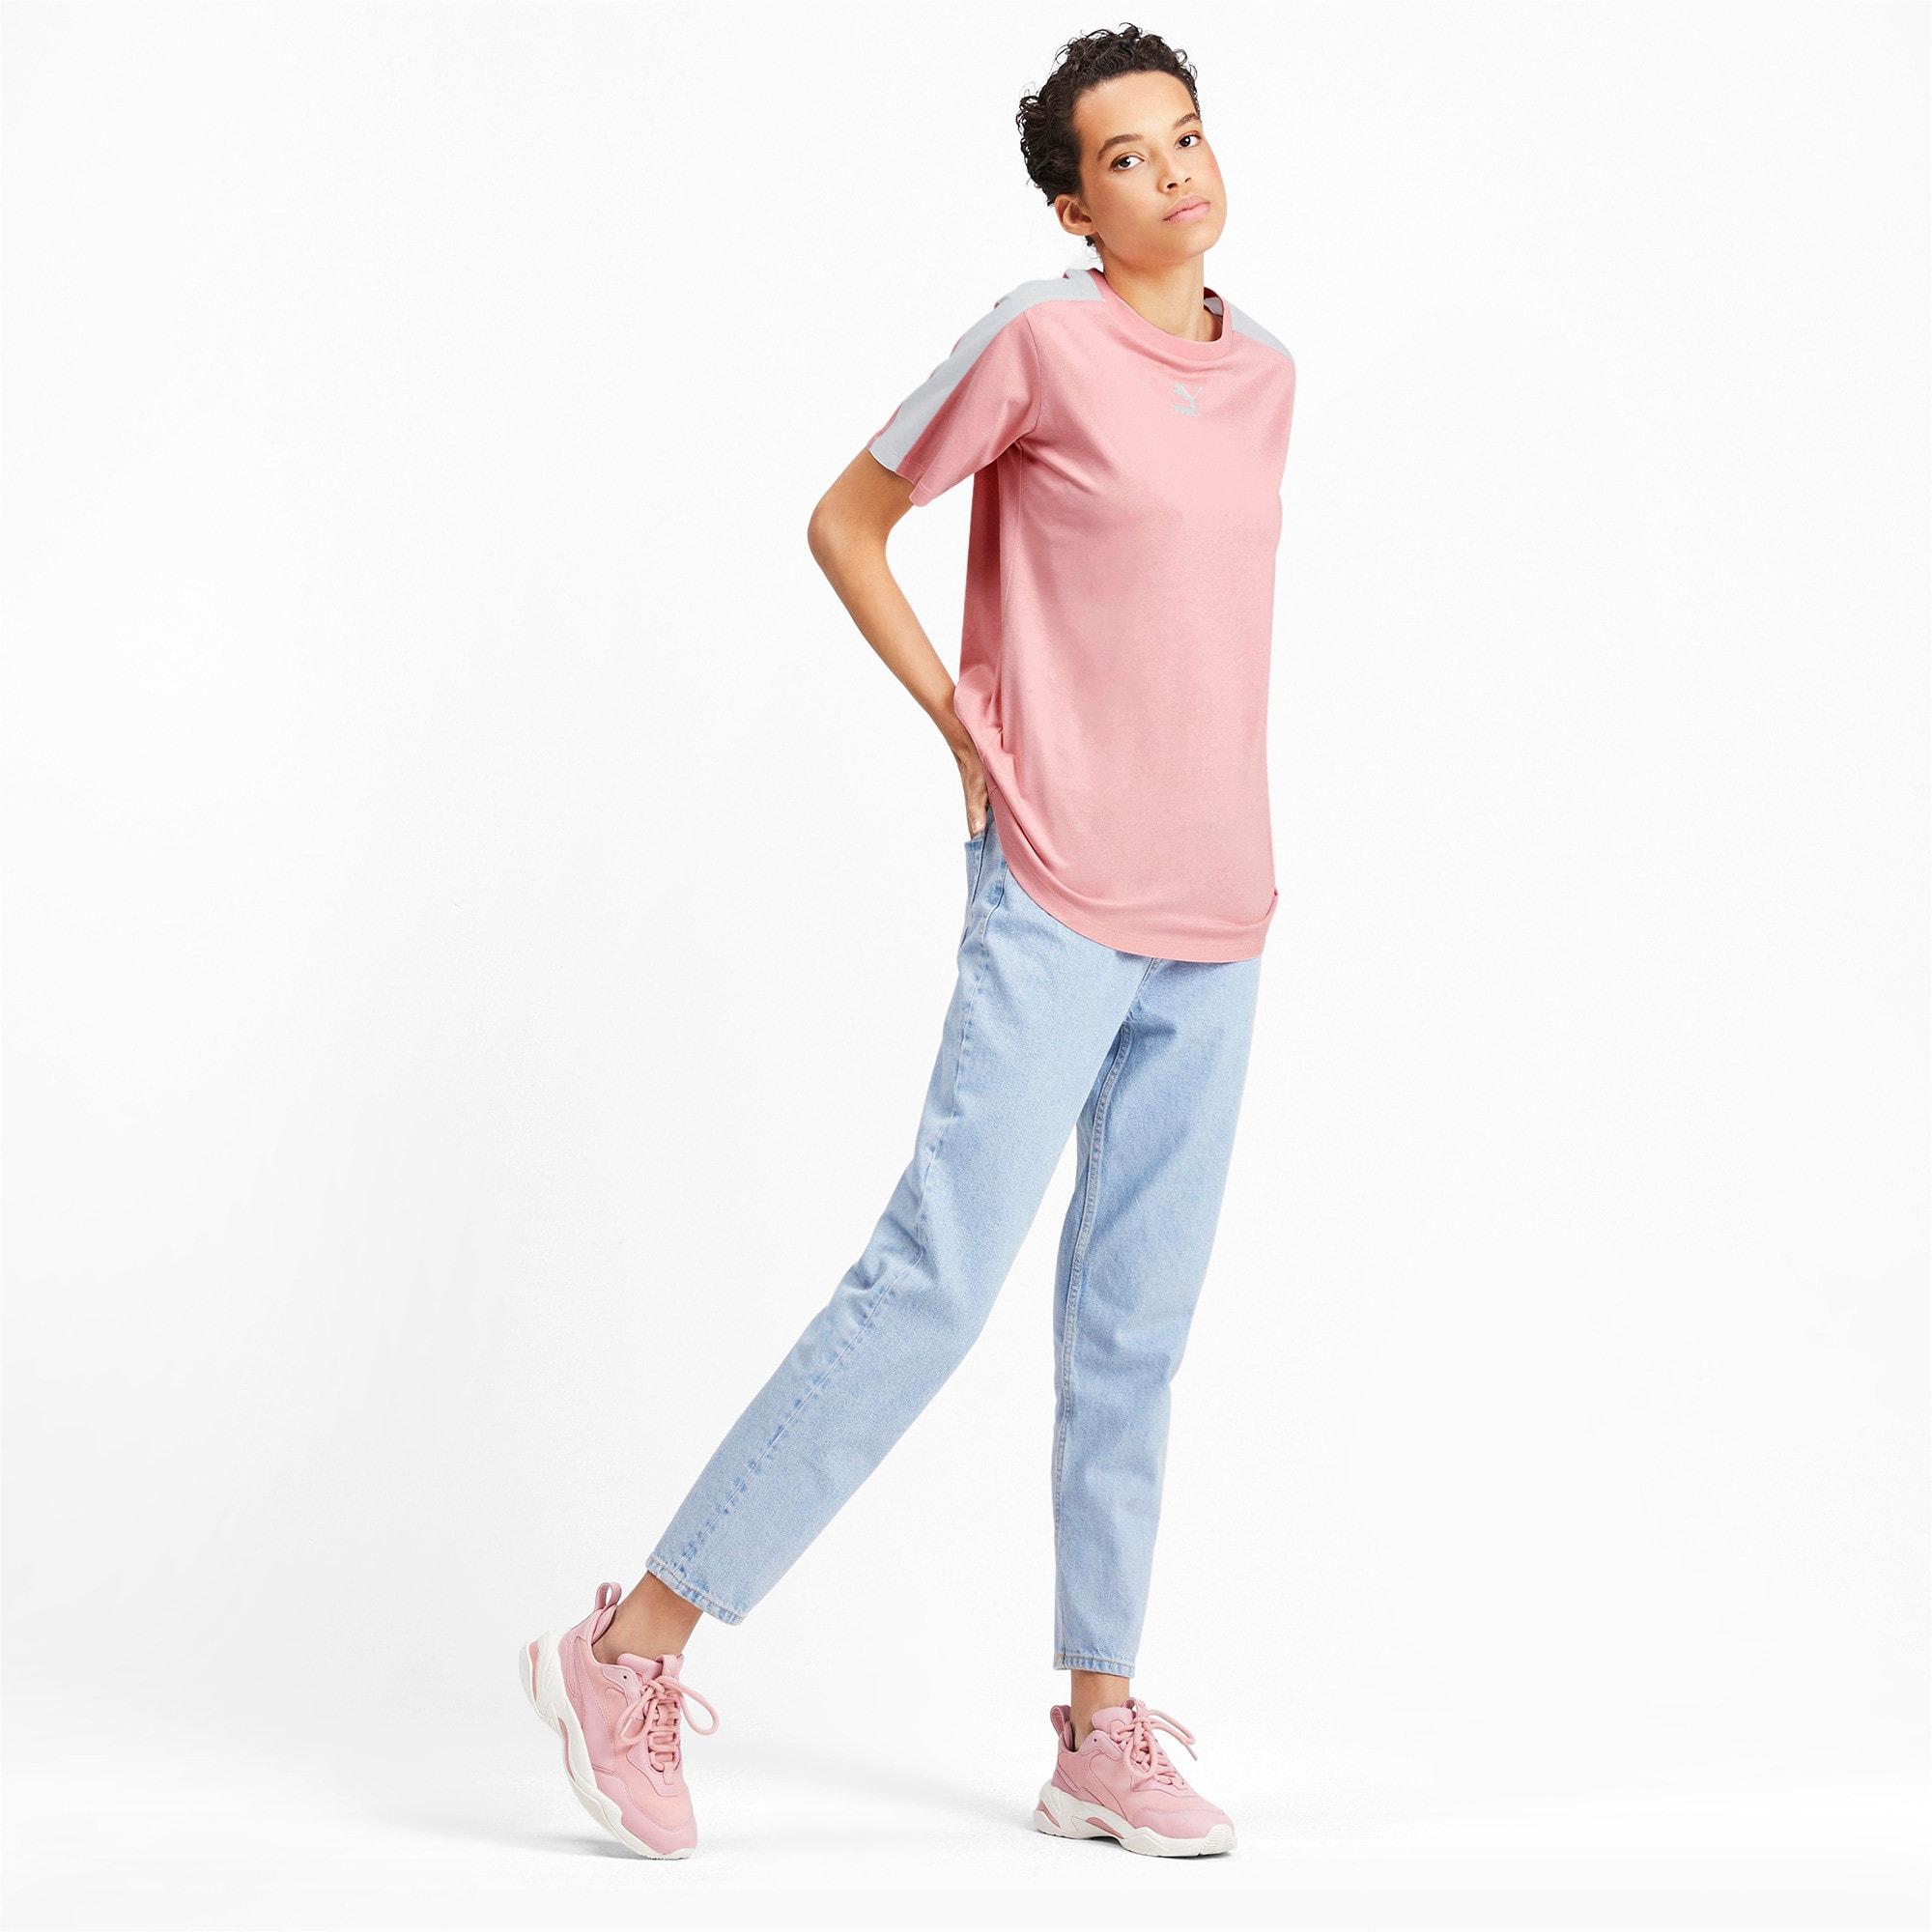 Miniatura 3 de Camiseta Classics T7 para mujer, Bridal Rose, mediano